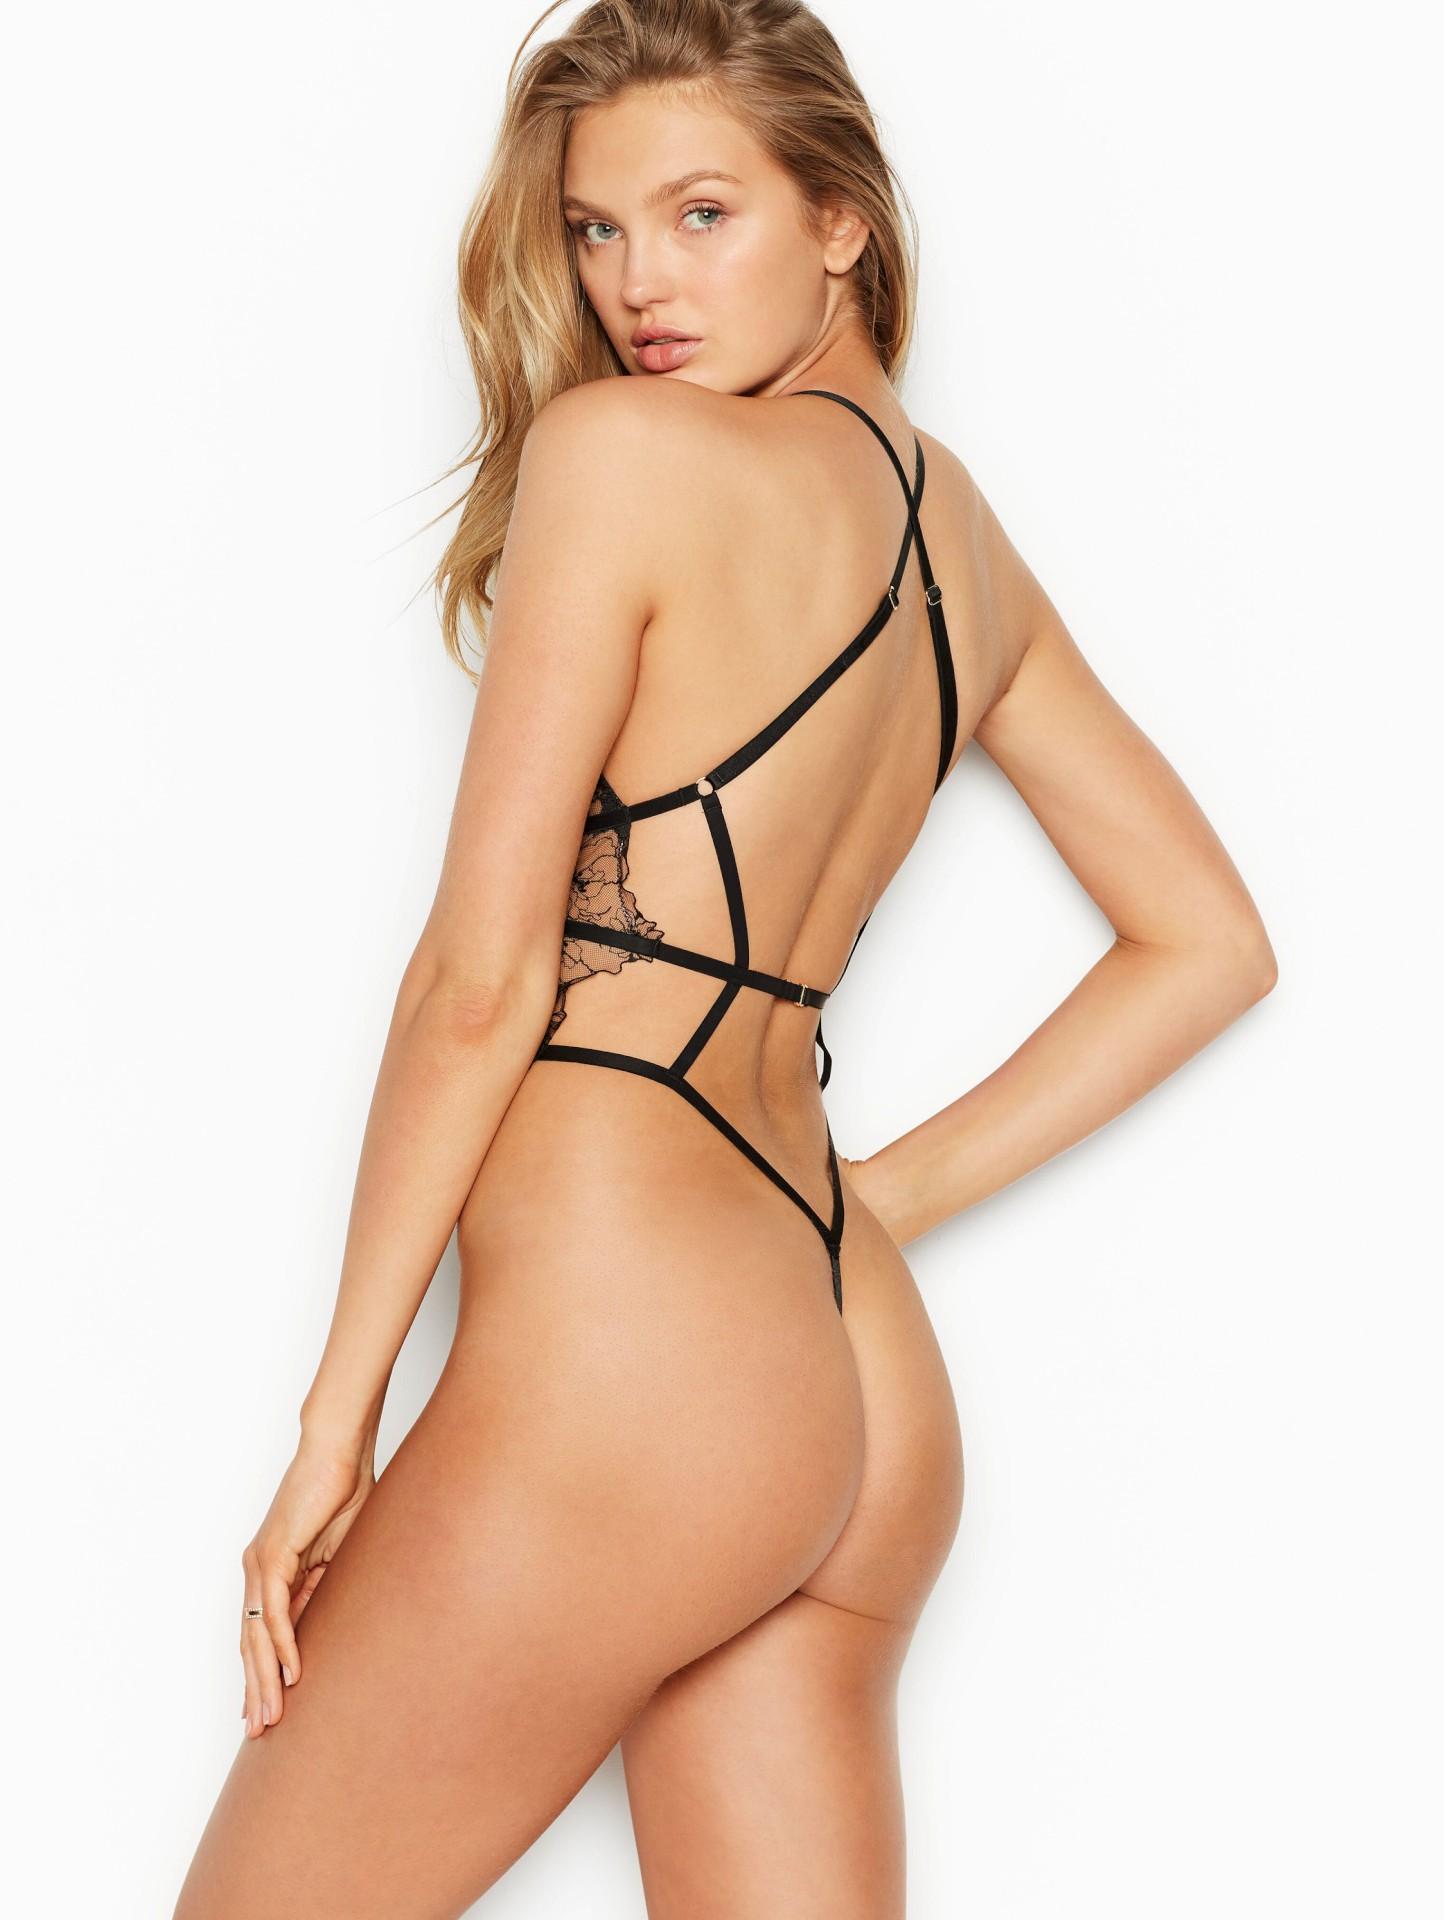 Romee Strijd Sexy Lingerie